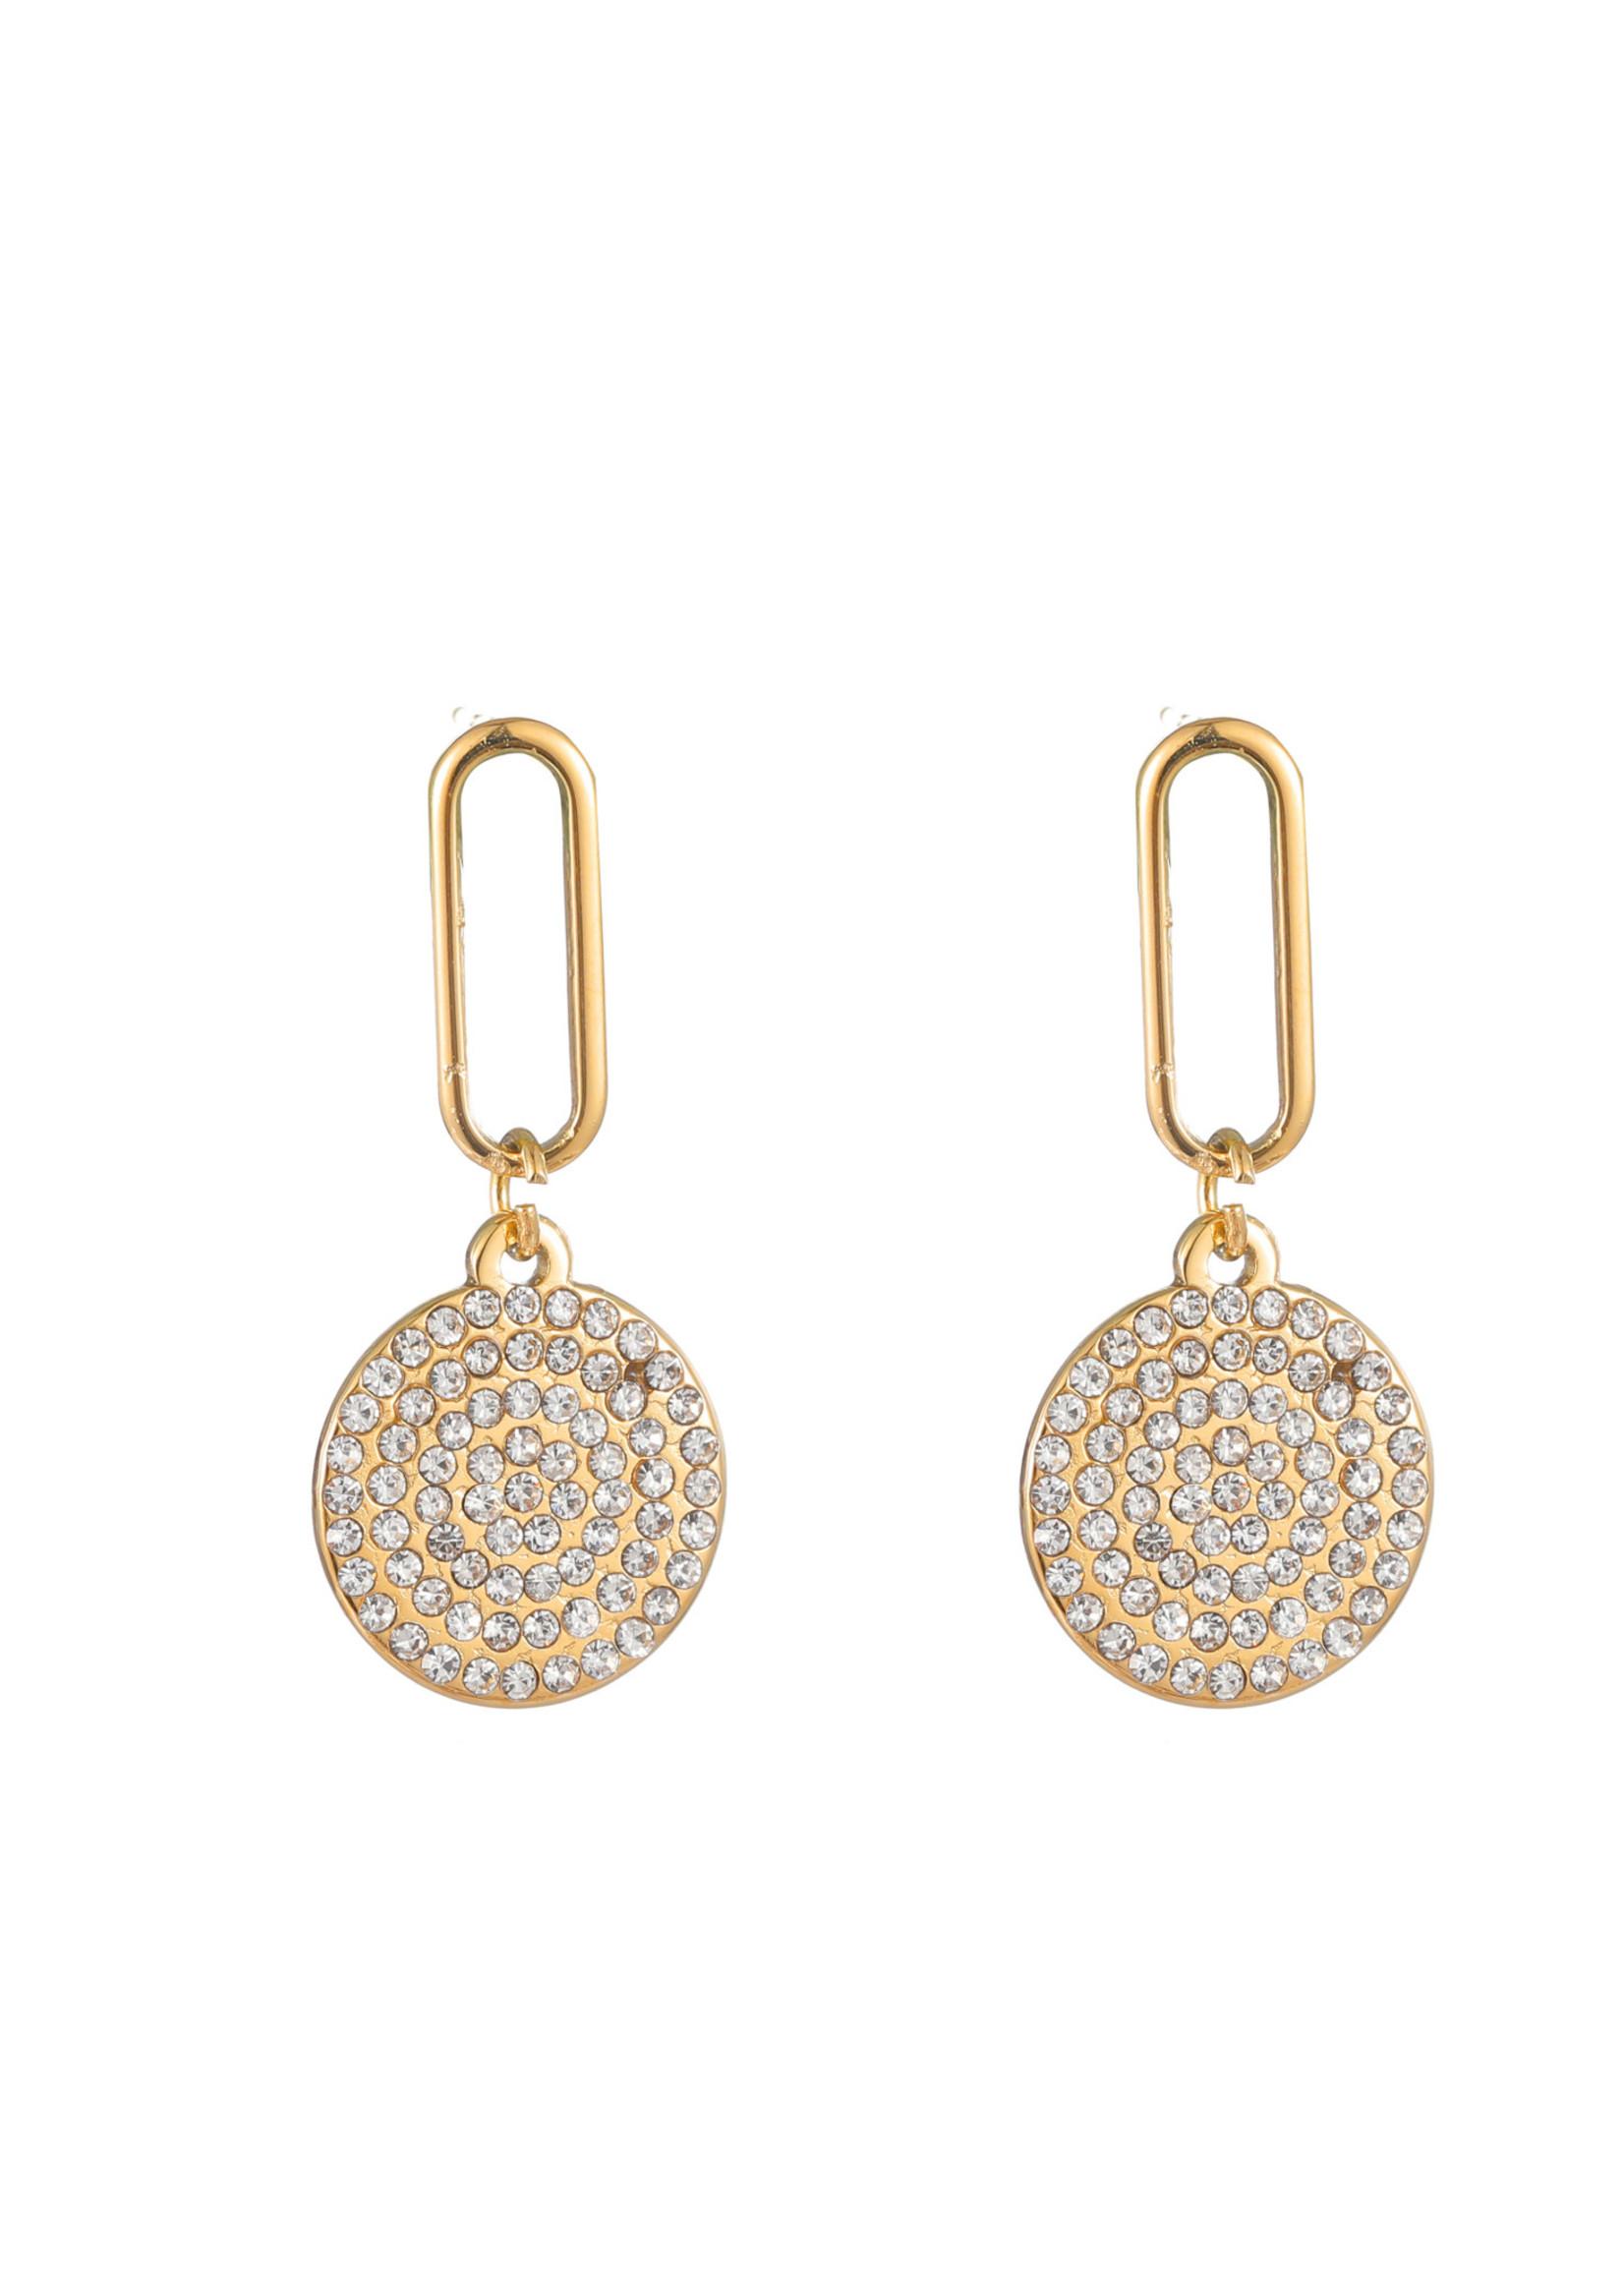 Oorbel goud hanger met crystal steentjes E1700-2